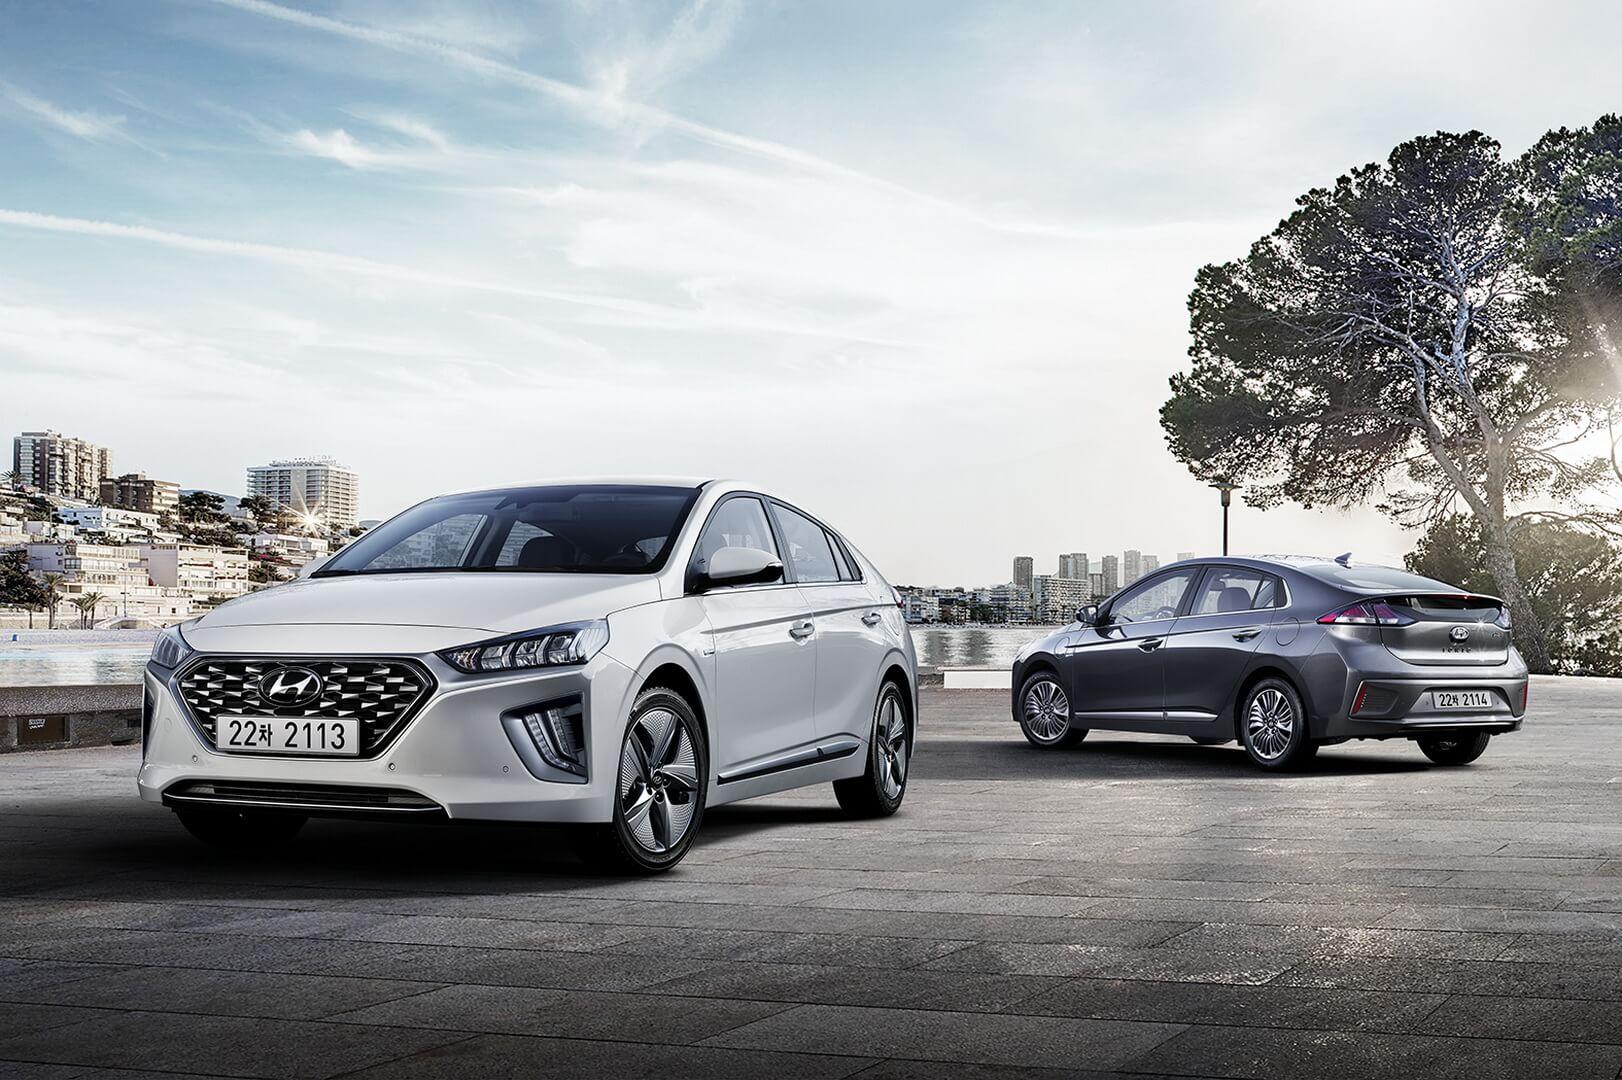 Новые гибриды и плагин-гибриды Hyundai IONIQ 2019 года